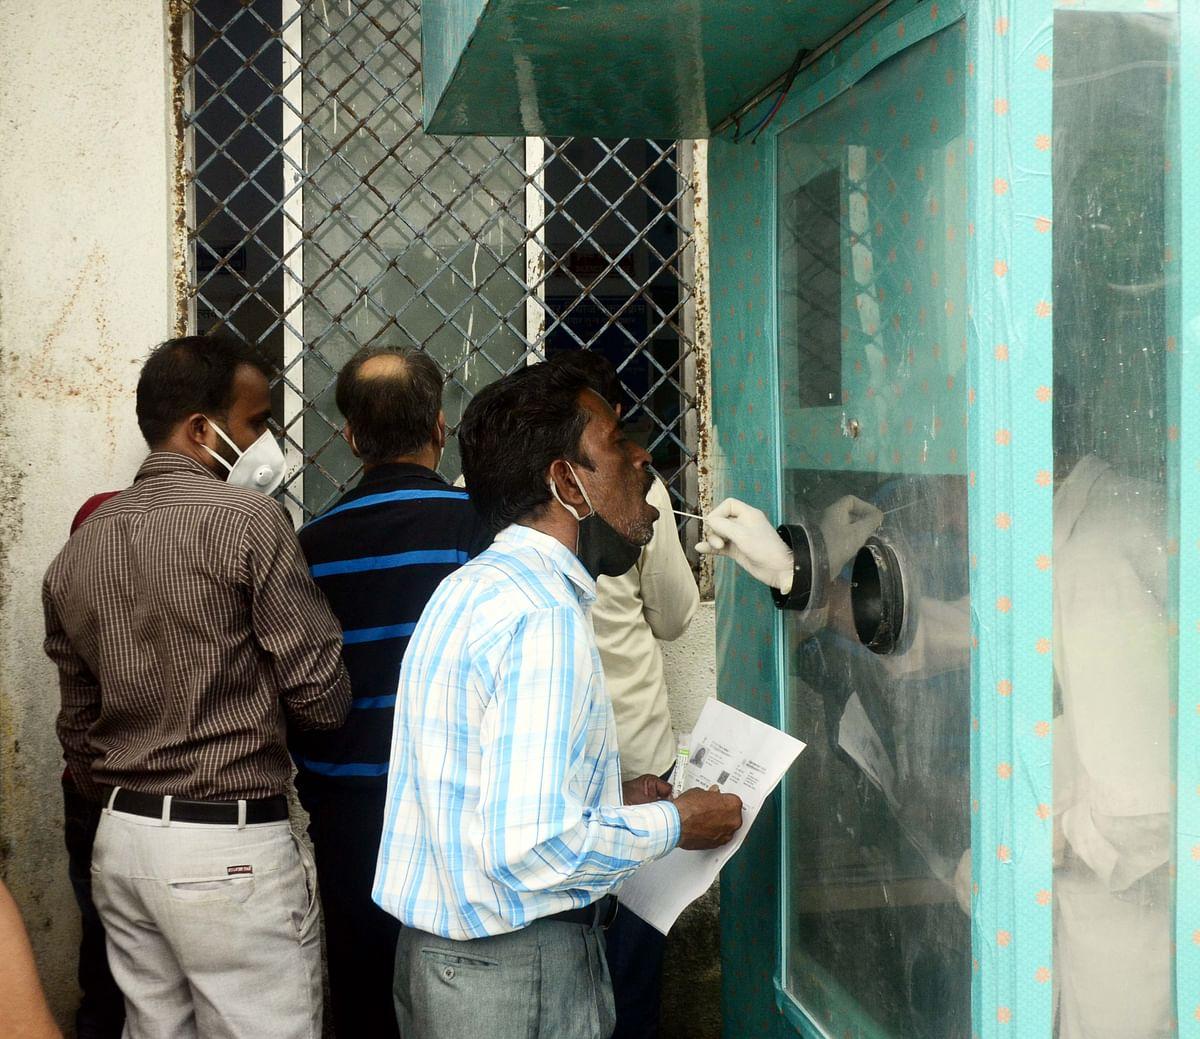 Coronavirus in Bhopal: Three GMC doctors among 150 test positive